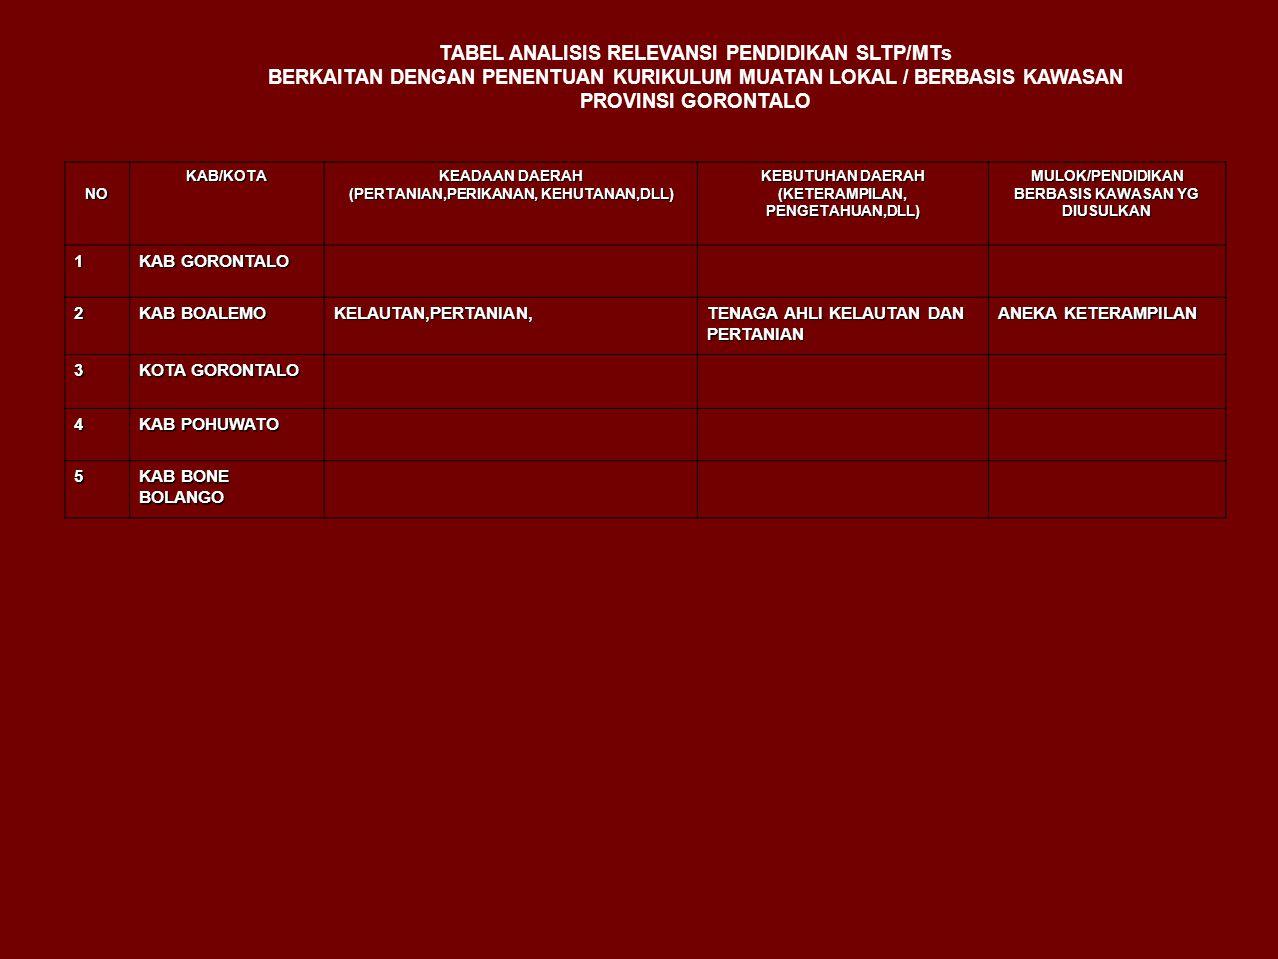 NOKAB/KOTA KEADAAN DAERAH (PERTANIAN,PERIKANAN, KEHUTANAN,DLL) KEBUTUHAN DAERAH (KETERAMPILAN, PENGETAHUAN,DLL) MULOK/PENDIDIKAN BERBASIS KAWASAN YG DIUSULKAN 1 KAB GORONTALO 2 KAB BOALEMO KELAUTAN,PERTANIAN, TENAGA AHLI KELAUTAN DAN PERTANIAN ANEKA KETERAMPILAN 3 KOTA GORONTALO 4 KAB POHUWATO 5 KAB BONE BOLANGO TABEL ANALISIS RELEVANSI PENDIDIKAN SLTP/MTs BERKAITAN DENGAN PENENTUAN KURIKULUM MUATAN LOKAL / BERBASIS KAWASAN PROVINSI GORONTALO